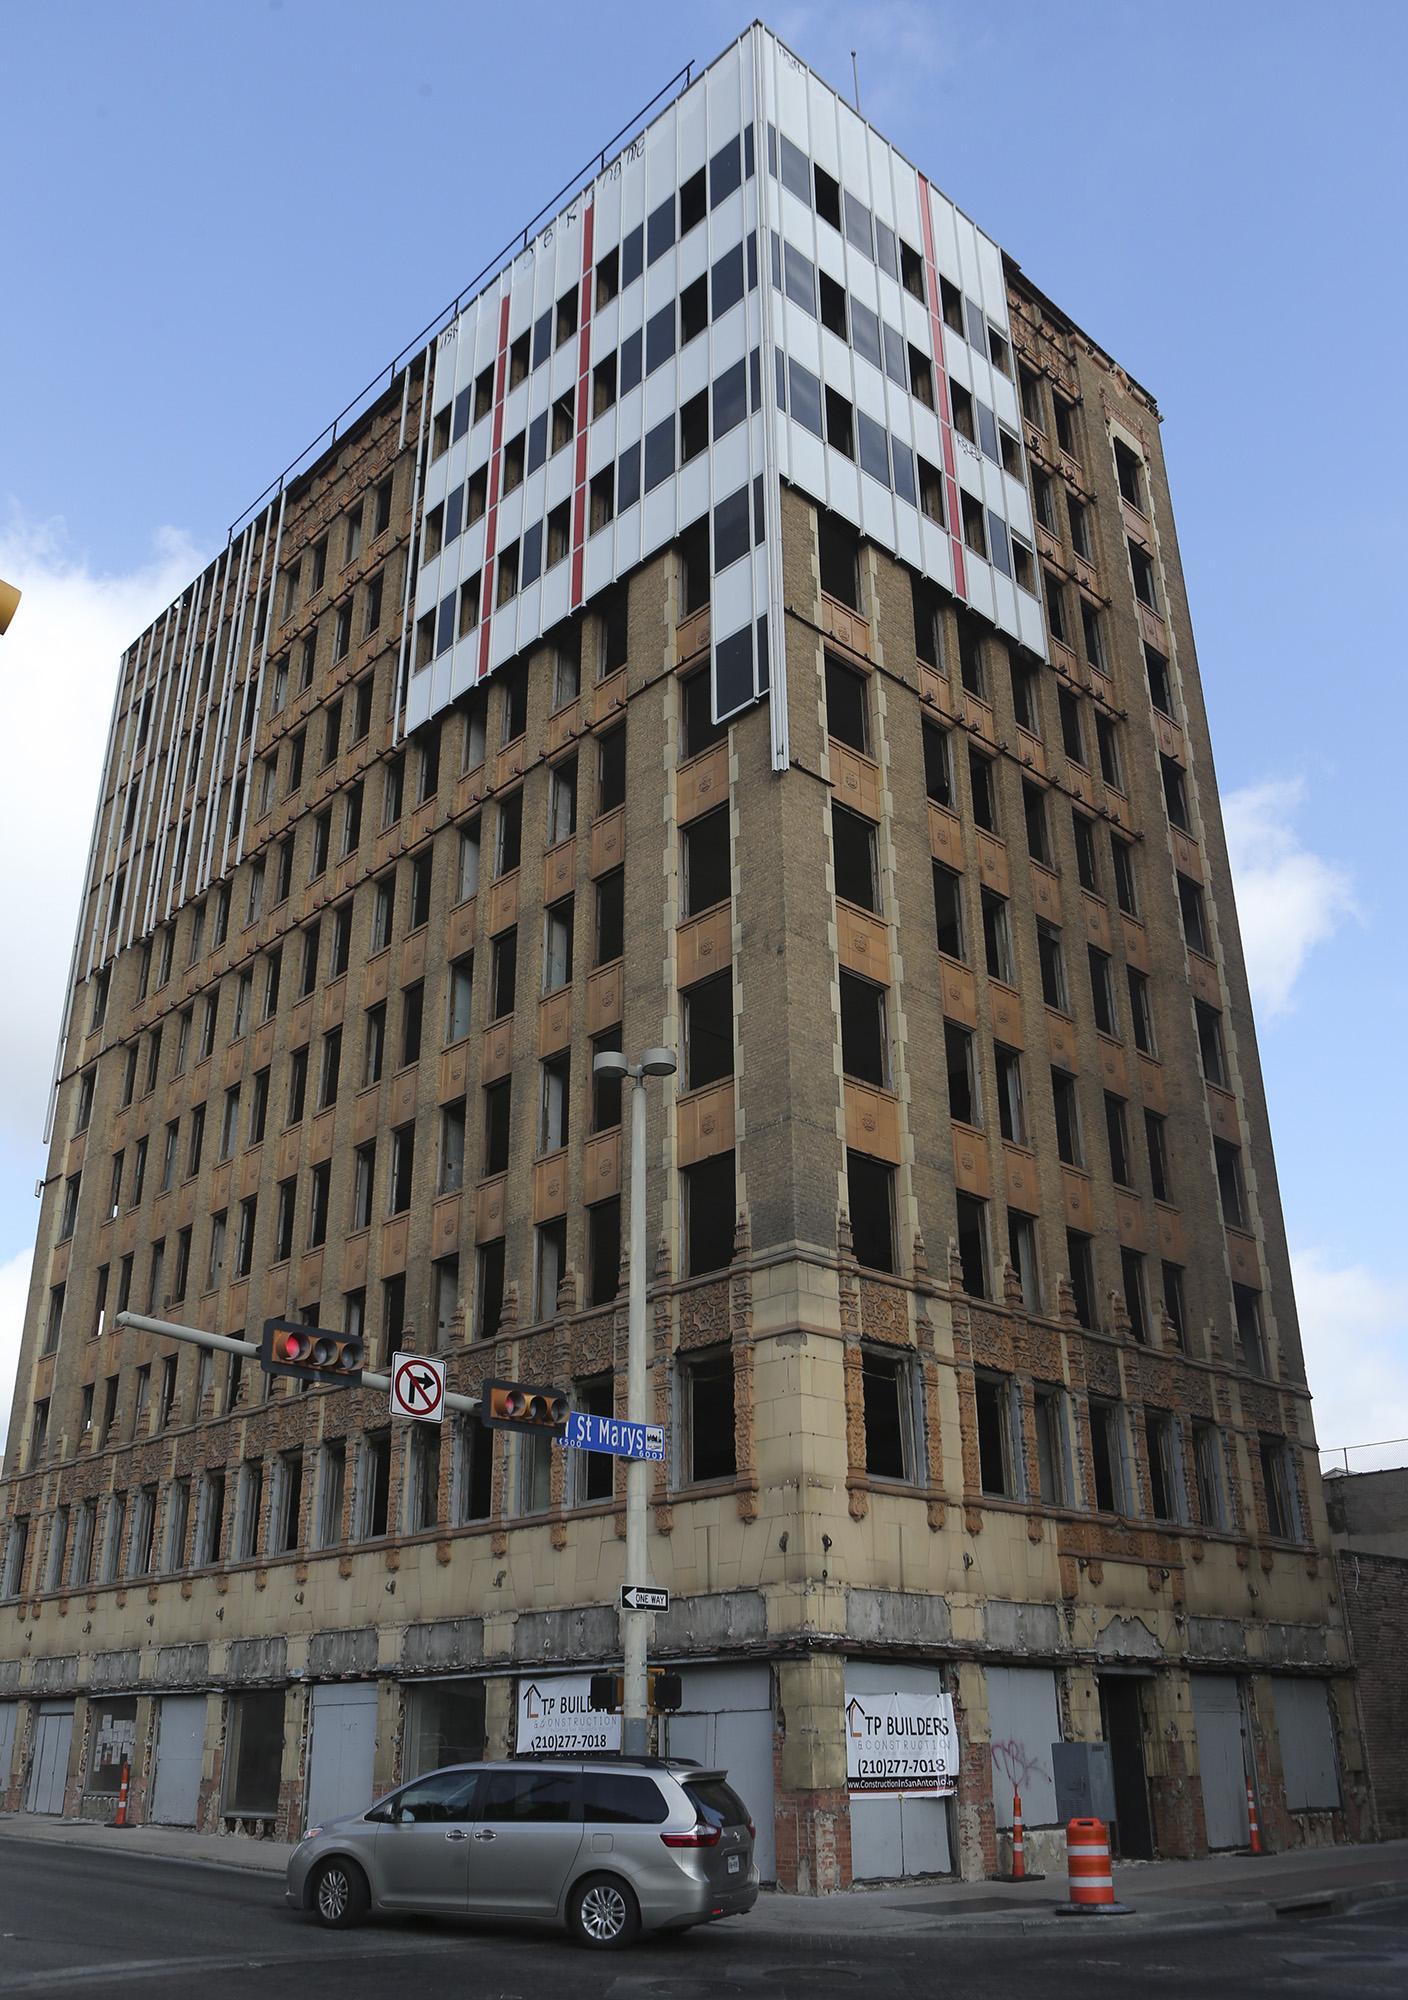 Downtown San Antonio Hedrick Building Has Its Hallelujah